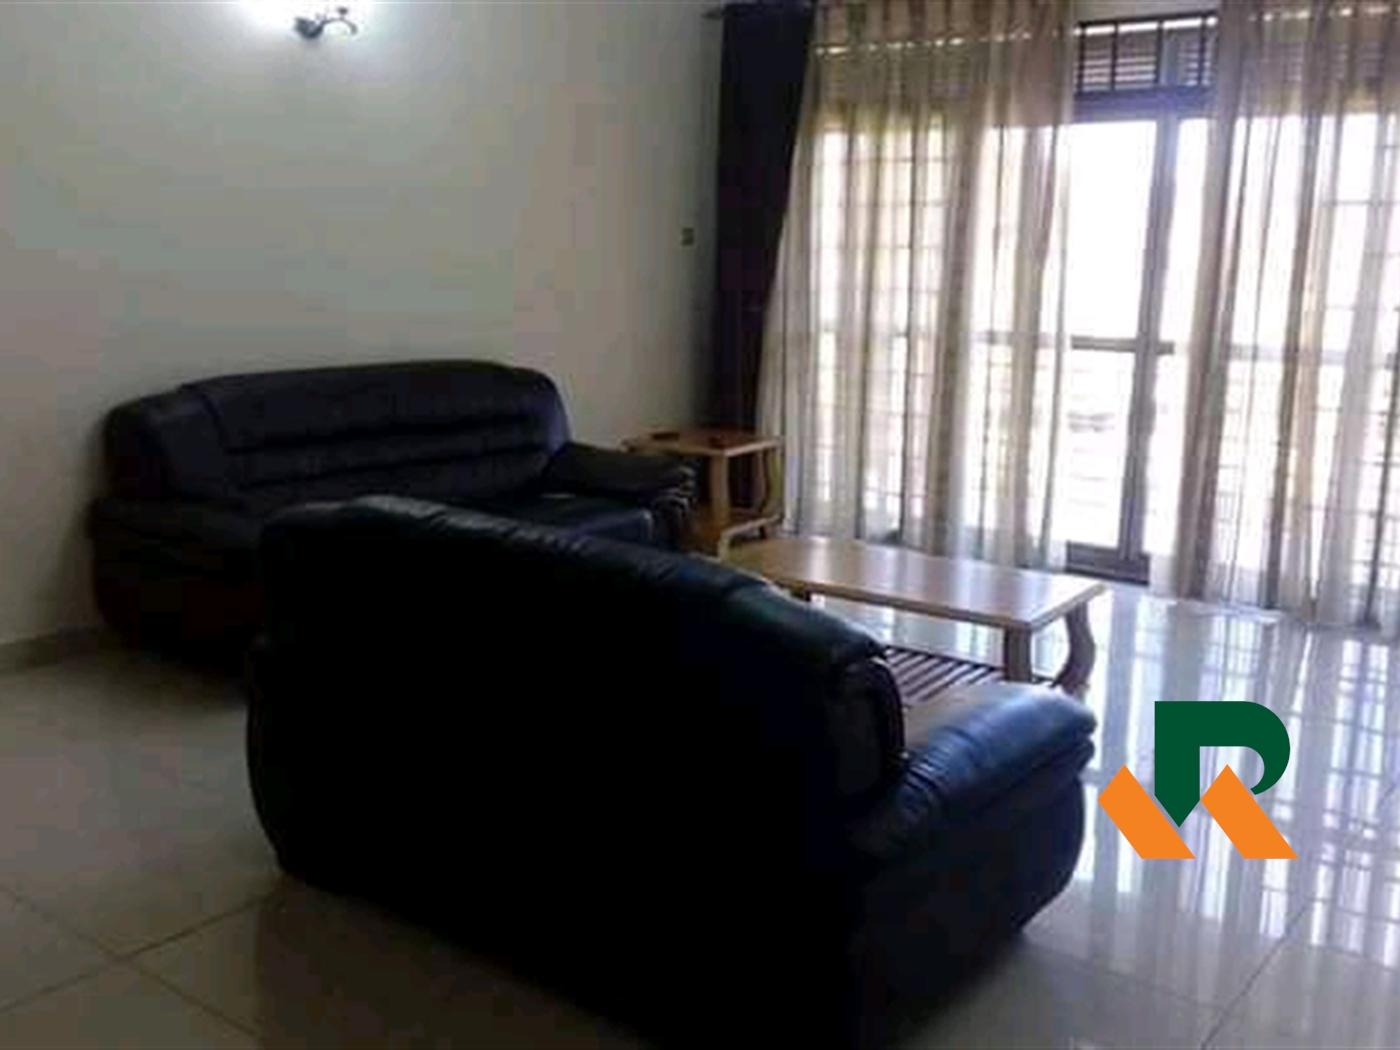 Apartment for rent in Kiwatule Wakiso